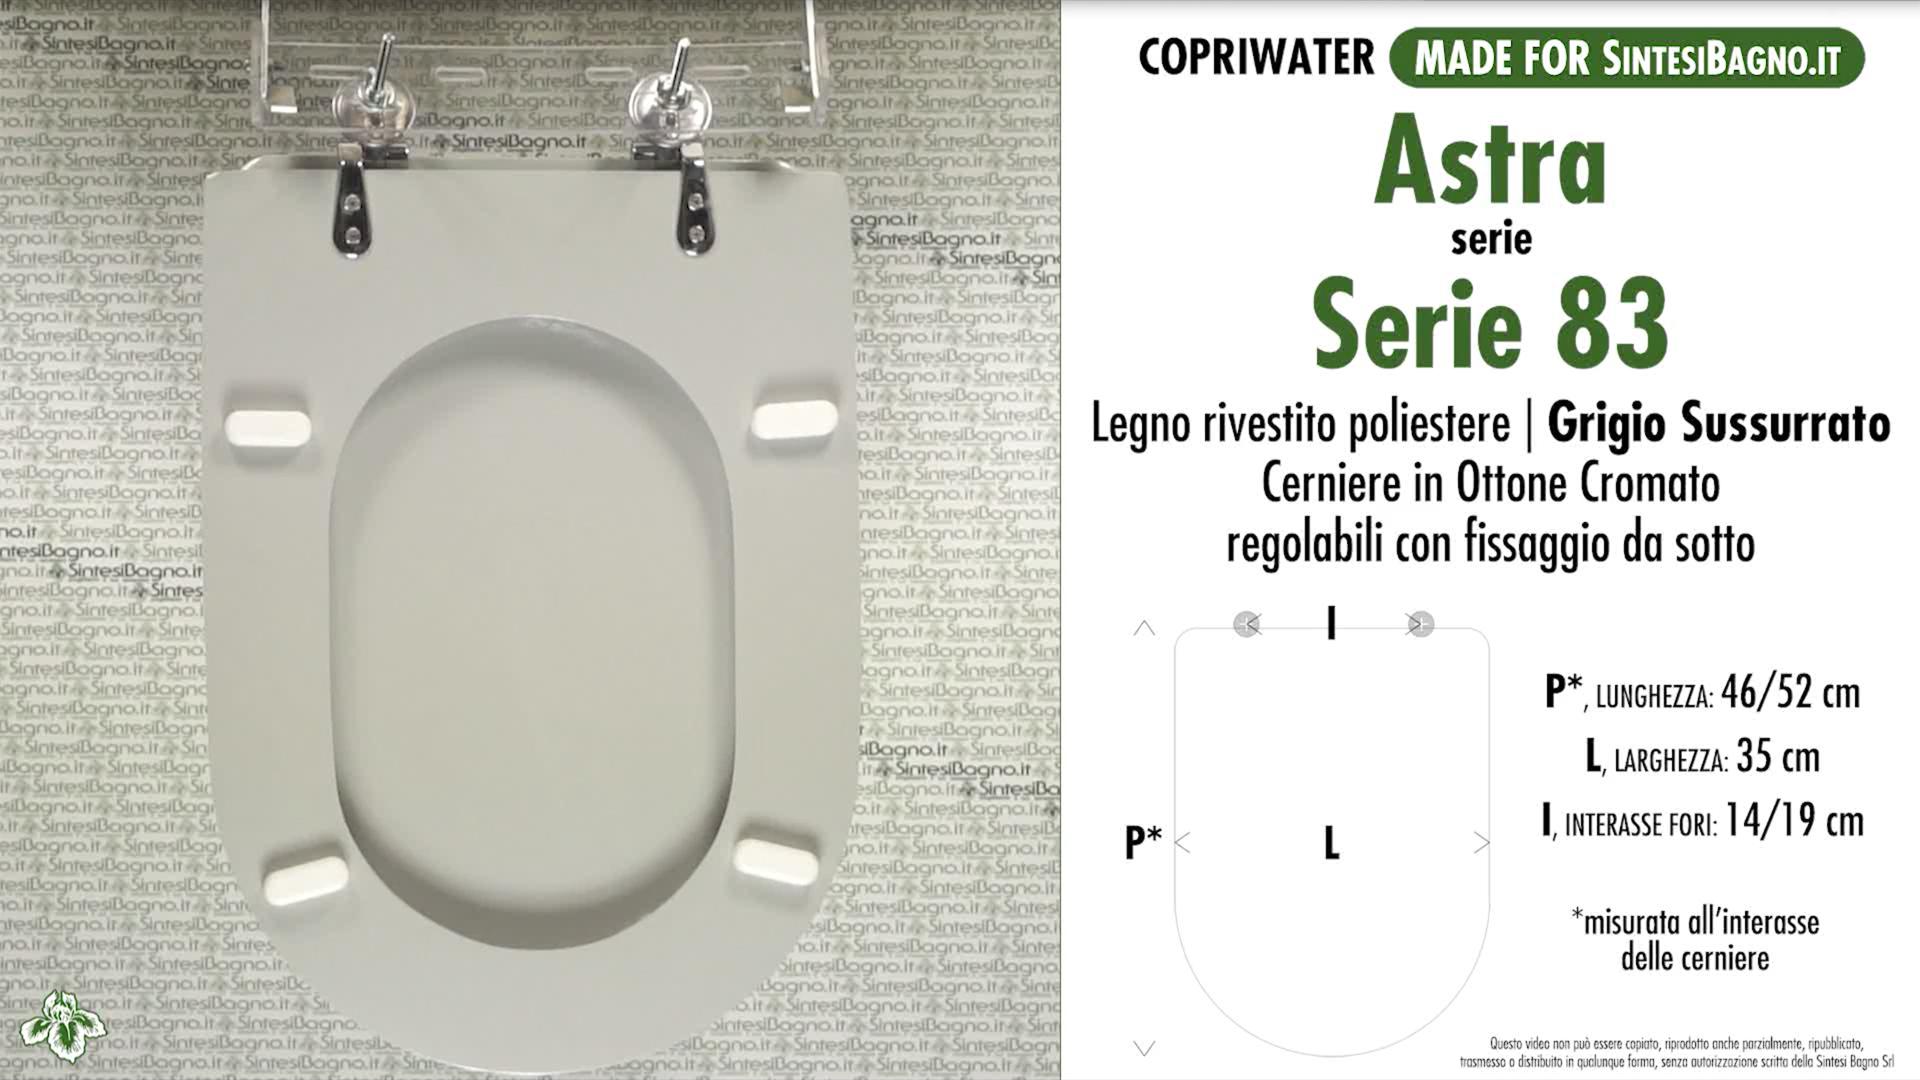 Schede tecniche Astra Serie 83